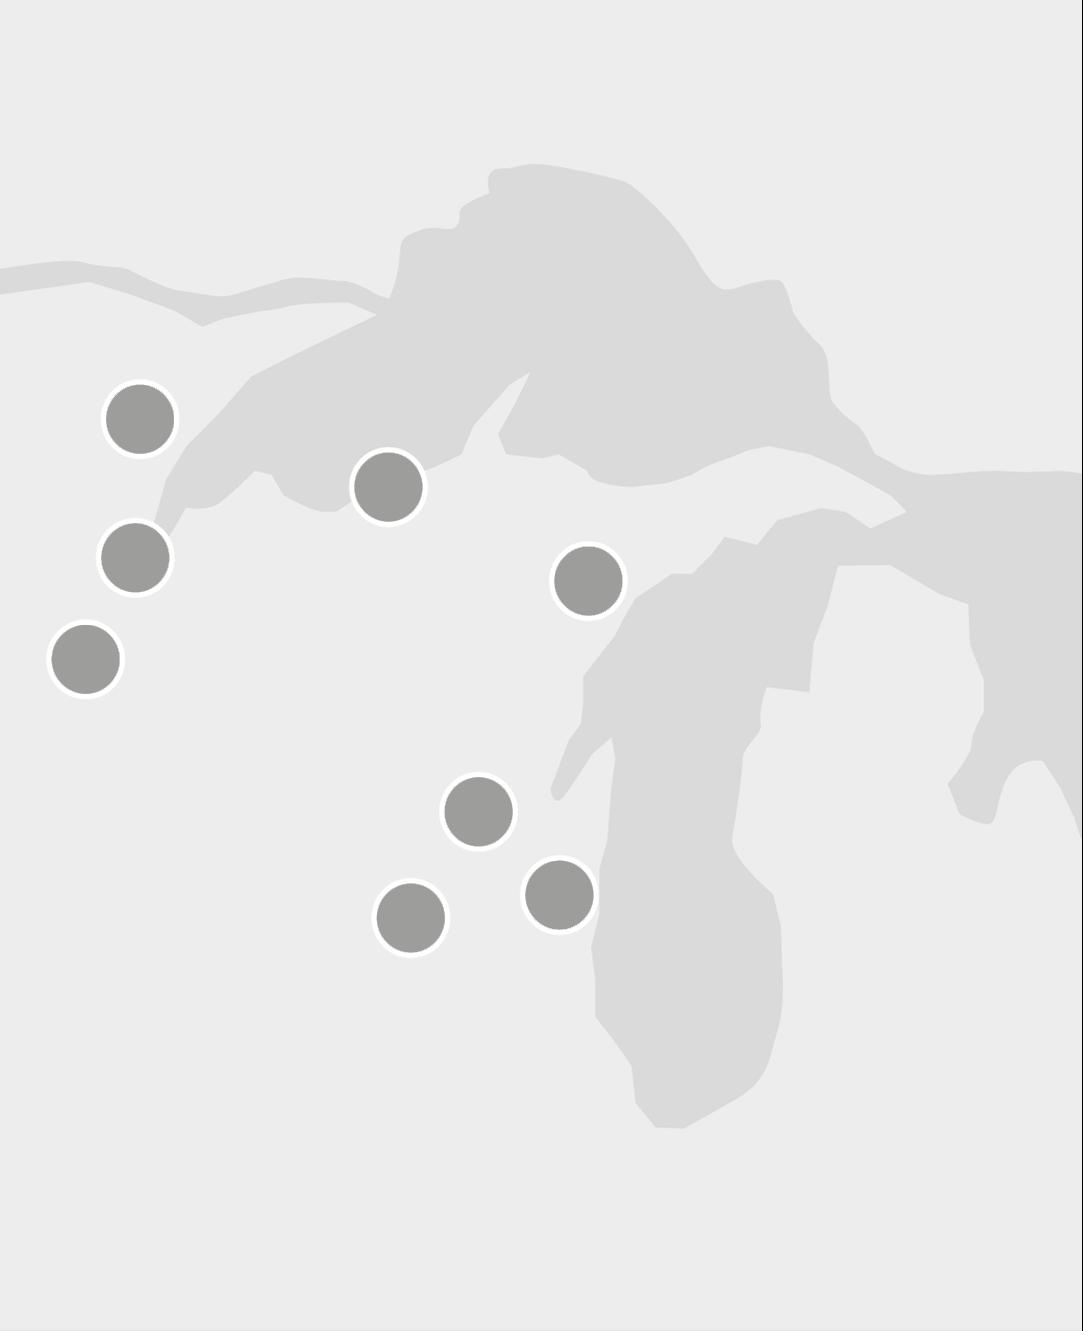 Midwestern Region Map